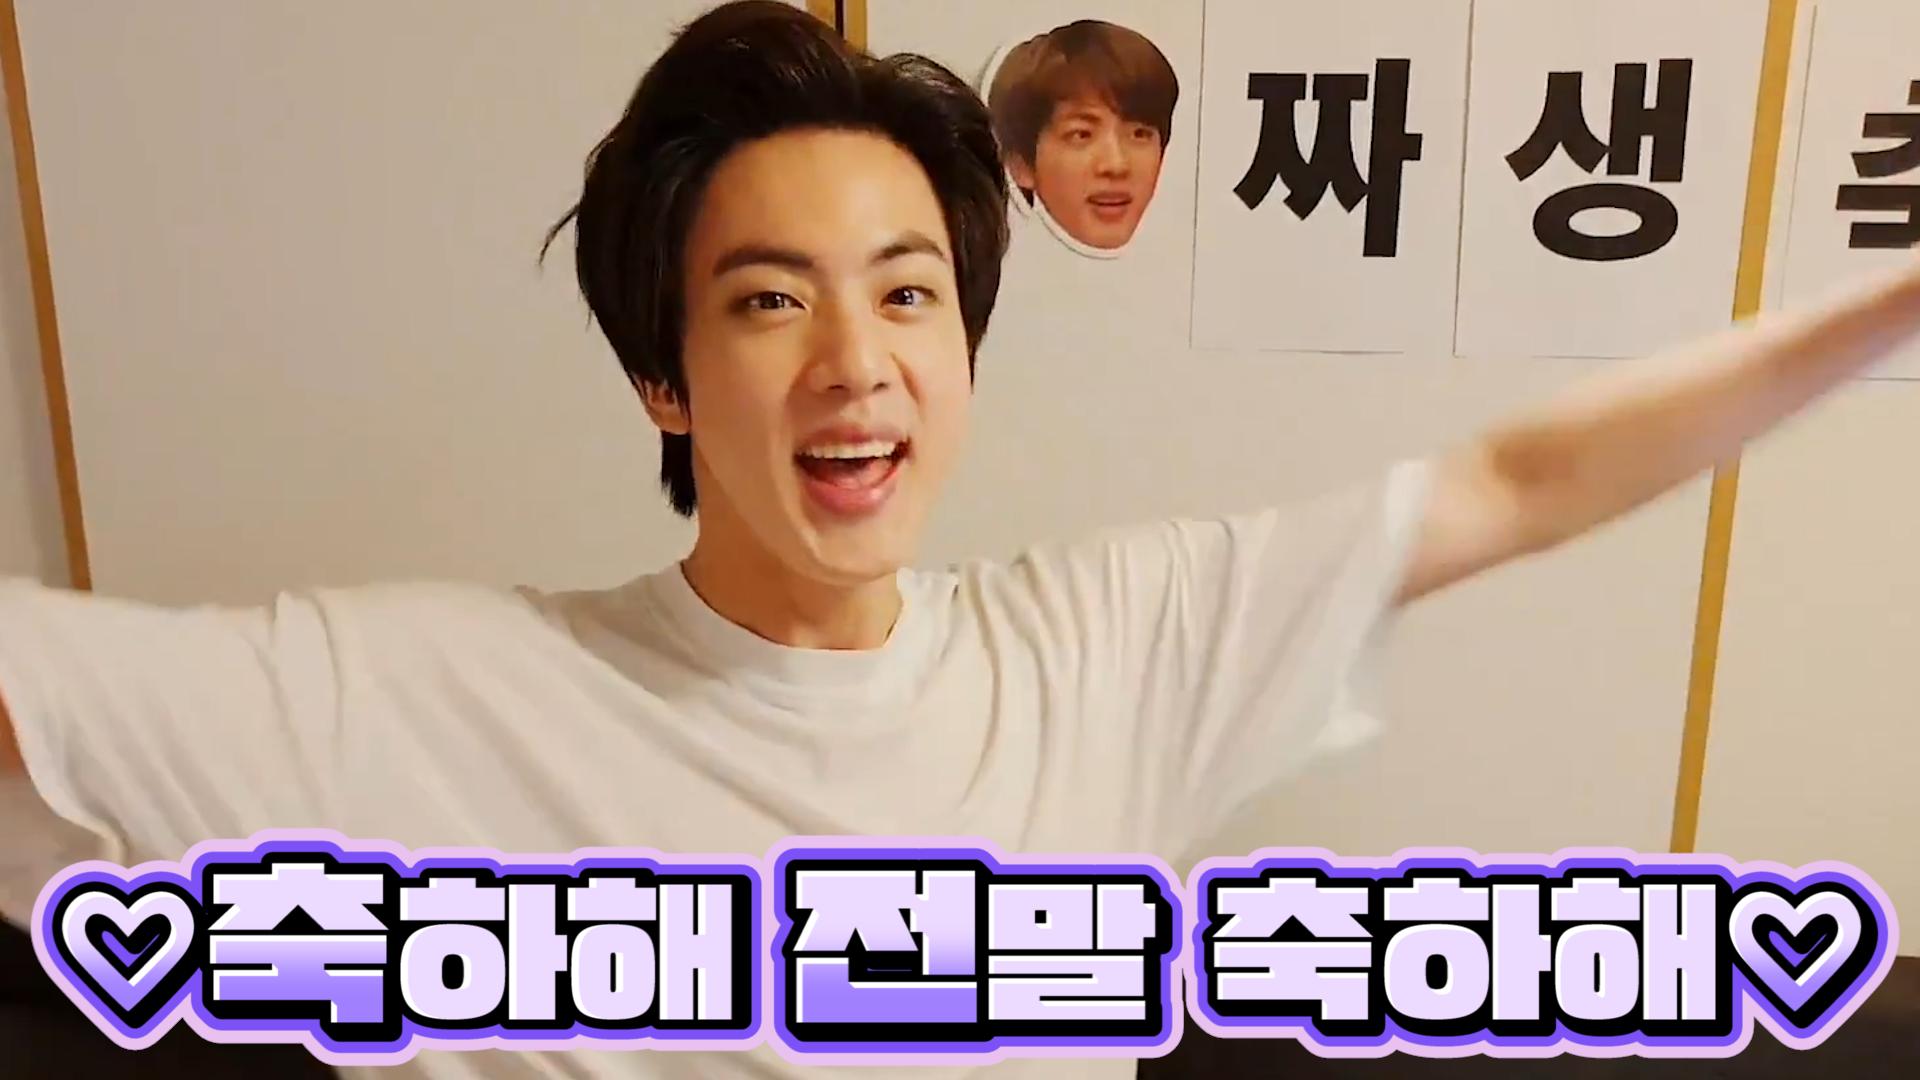 [BTS] 짜잘생긴 떠브유떠브유에이치 석진아 생일 축하해 전말전말!!!💜⁺◟(●˙▾˙●)◞⁺💜🎉 (HAPPY JIN DAY!)